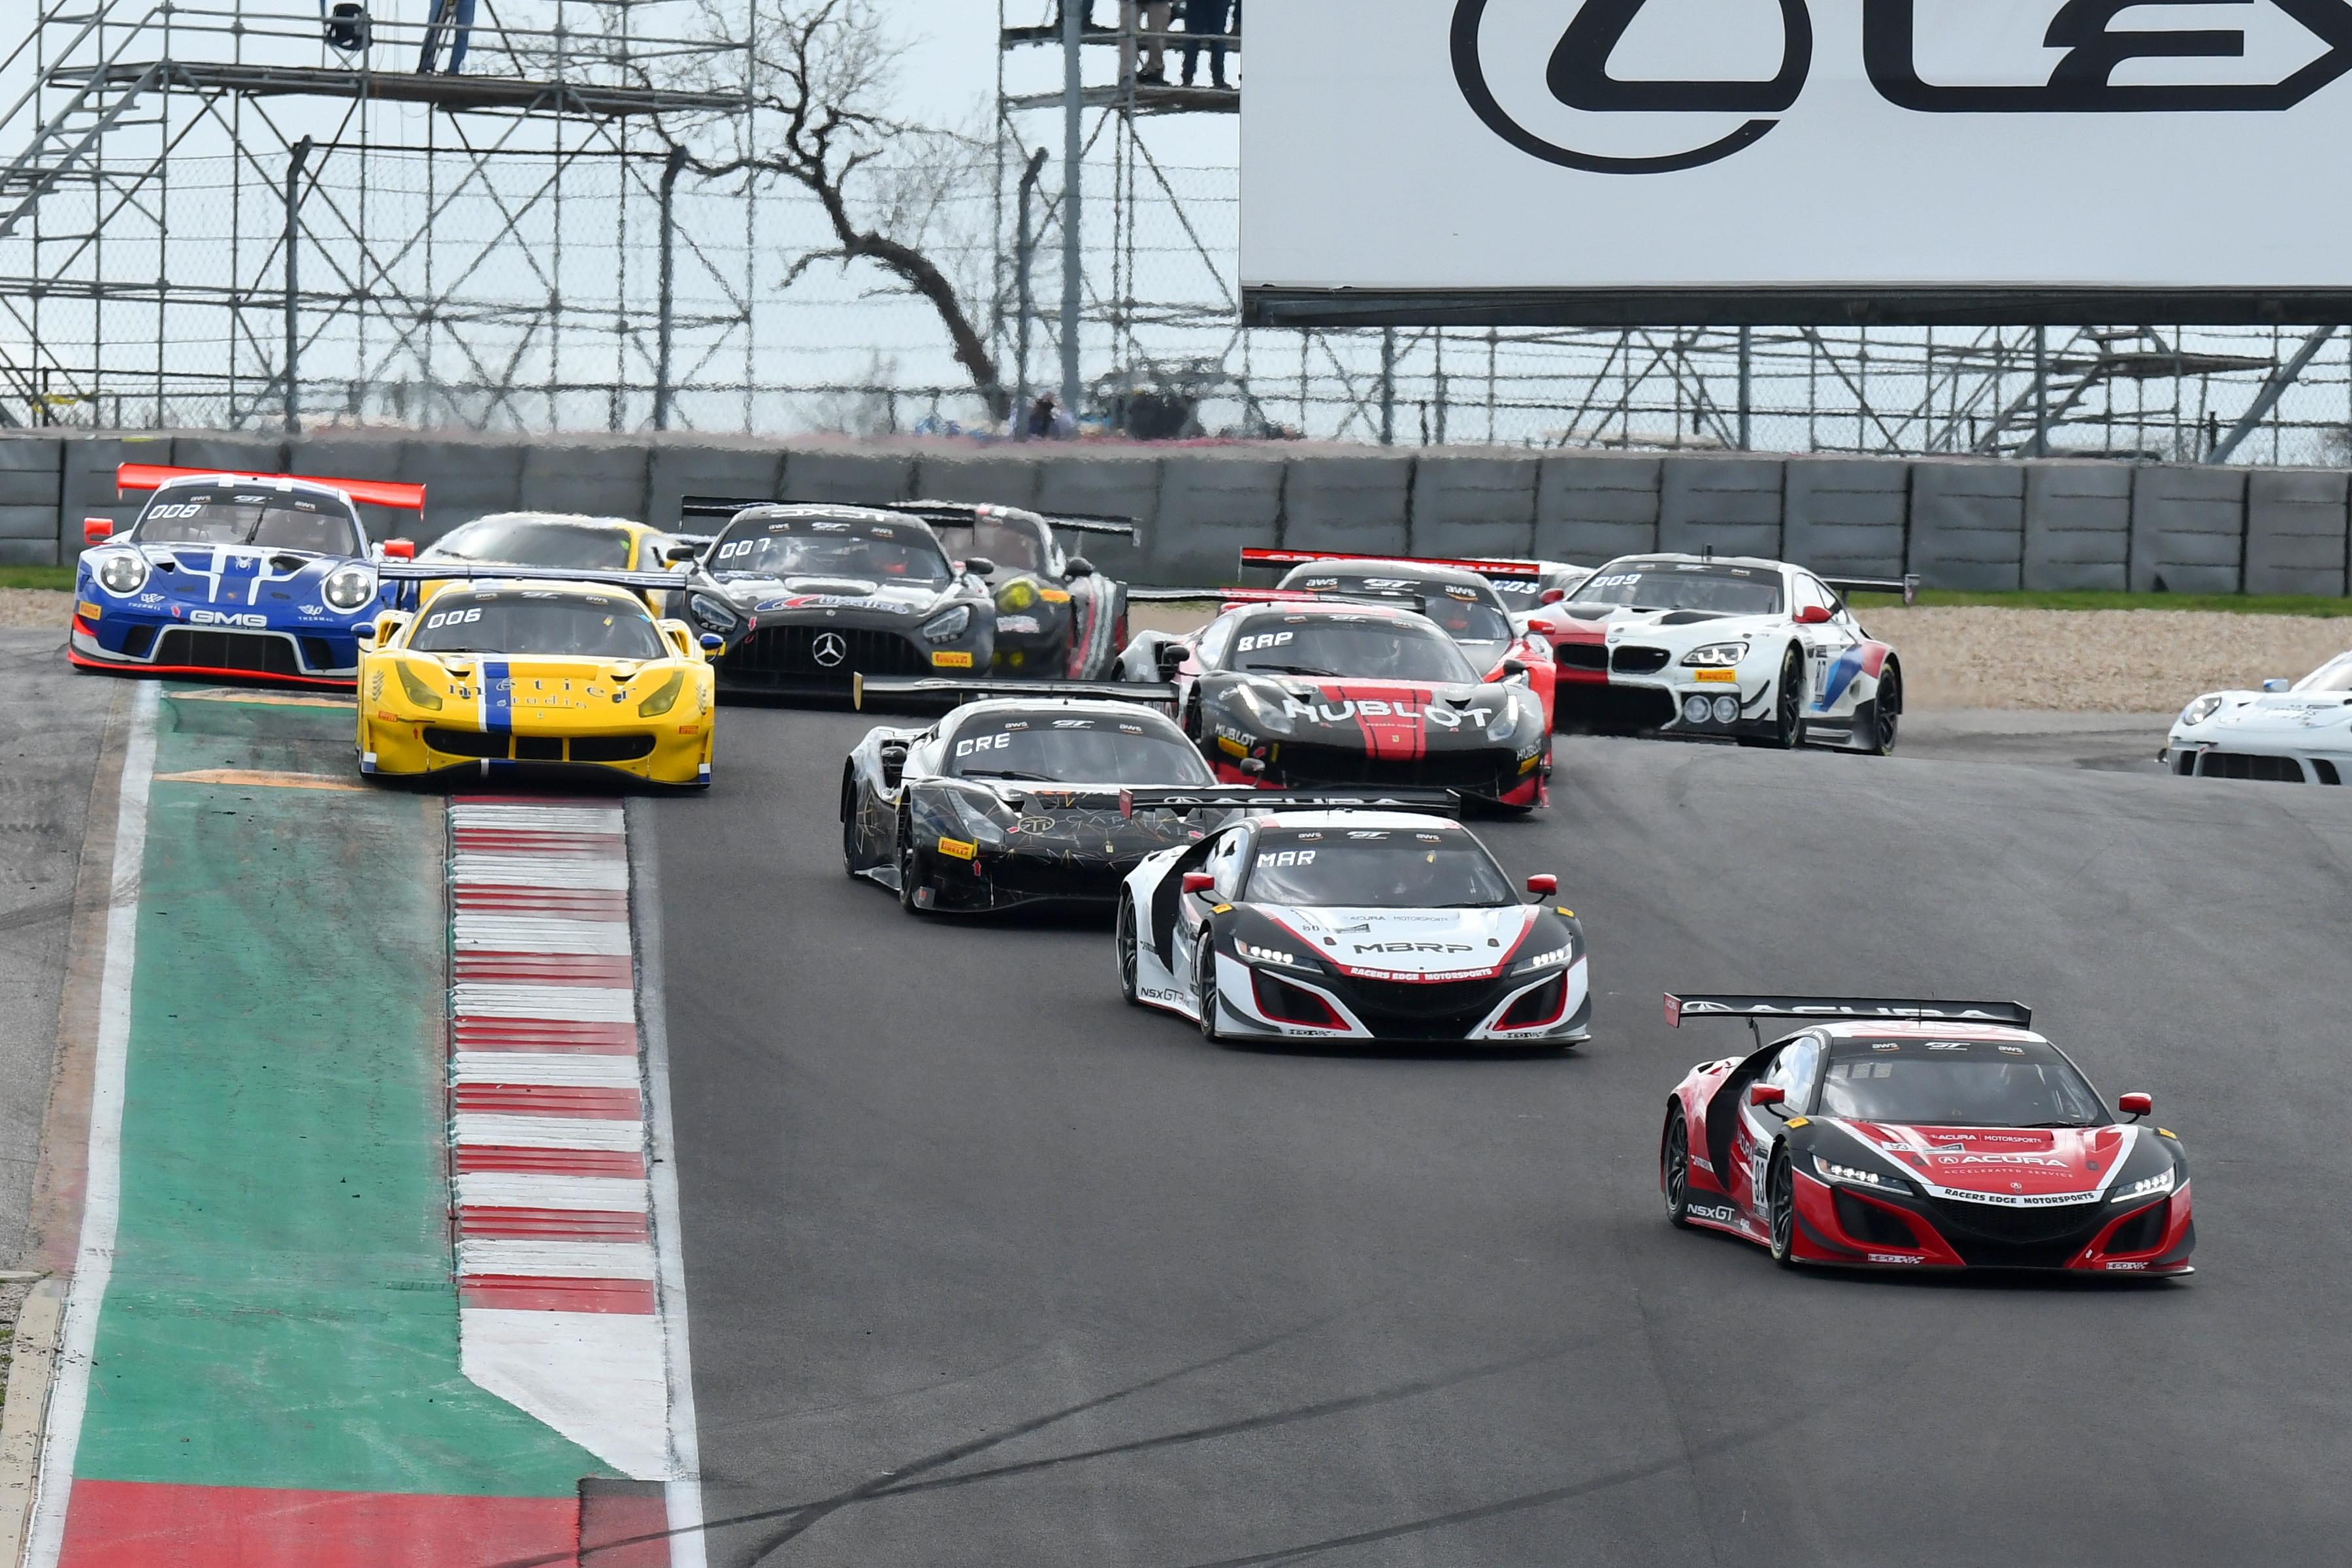 Srocota Honda Motorsports